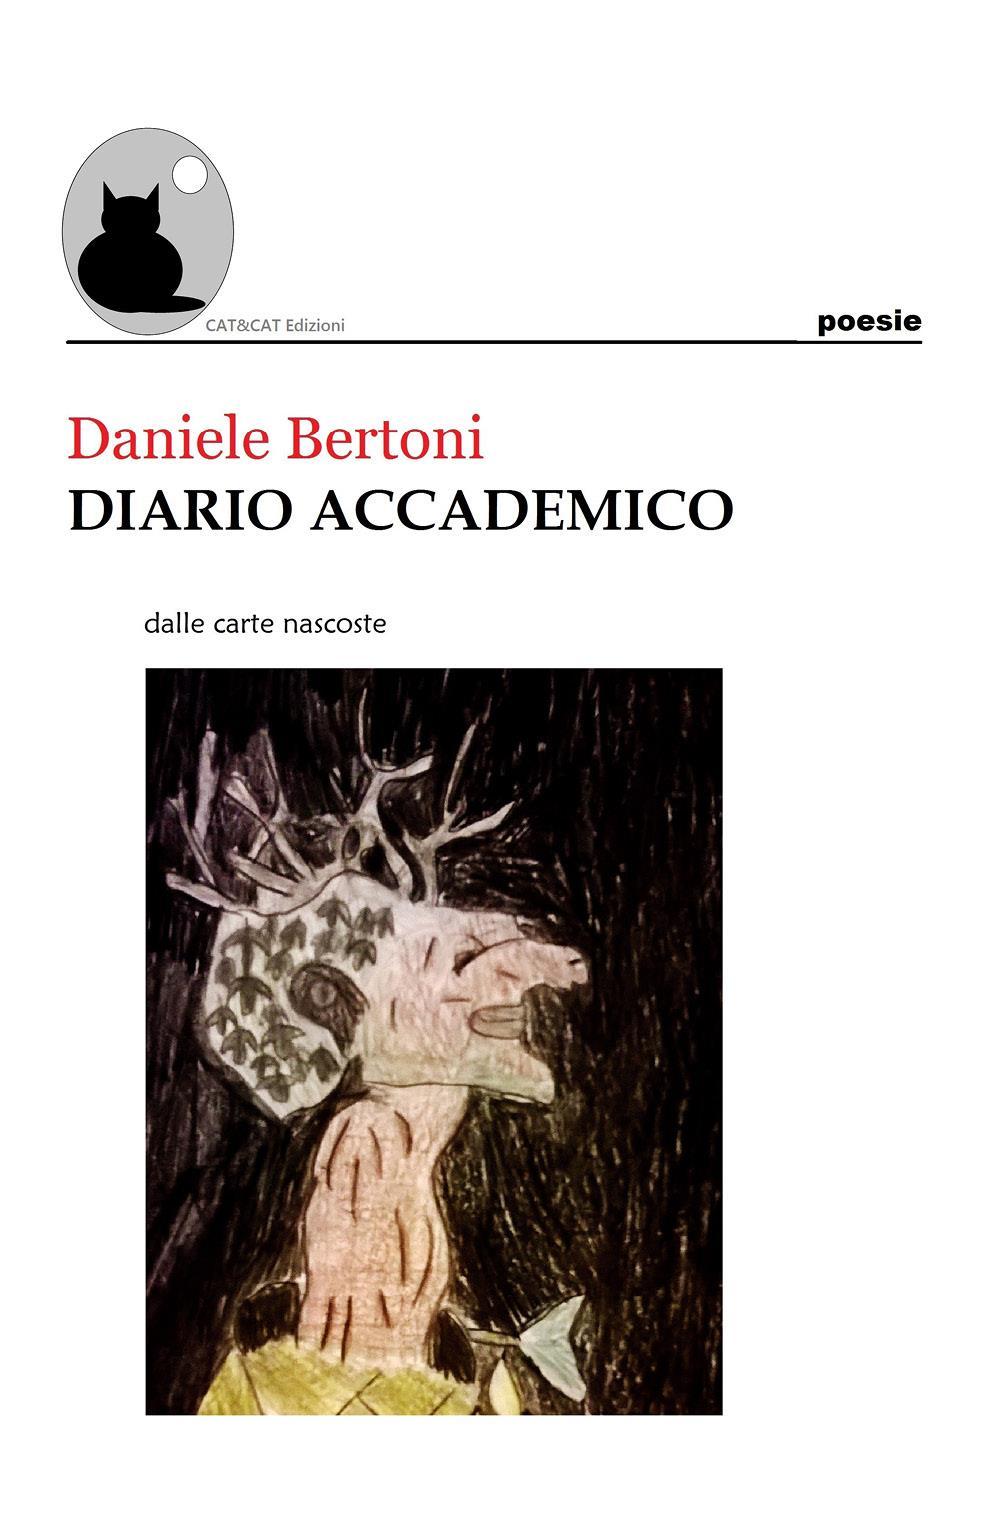 Diario Accademico